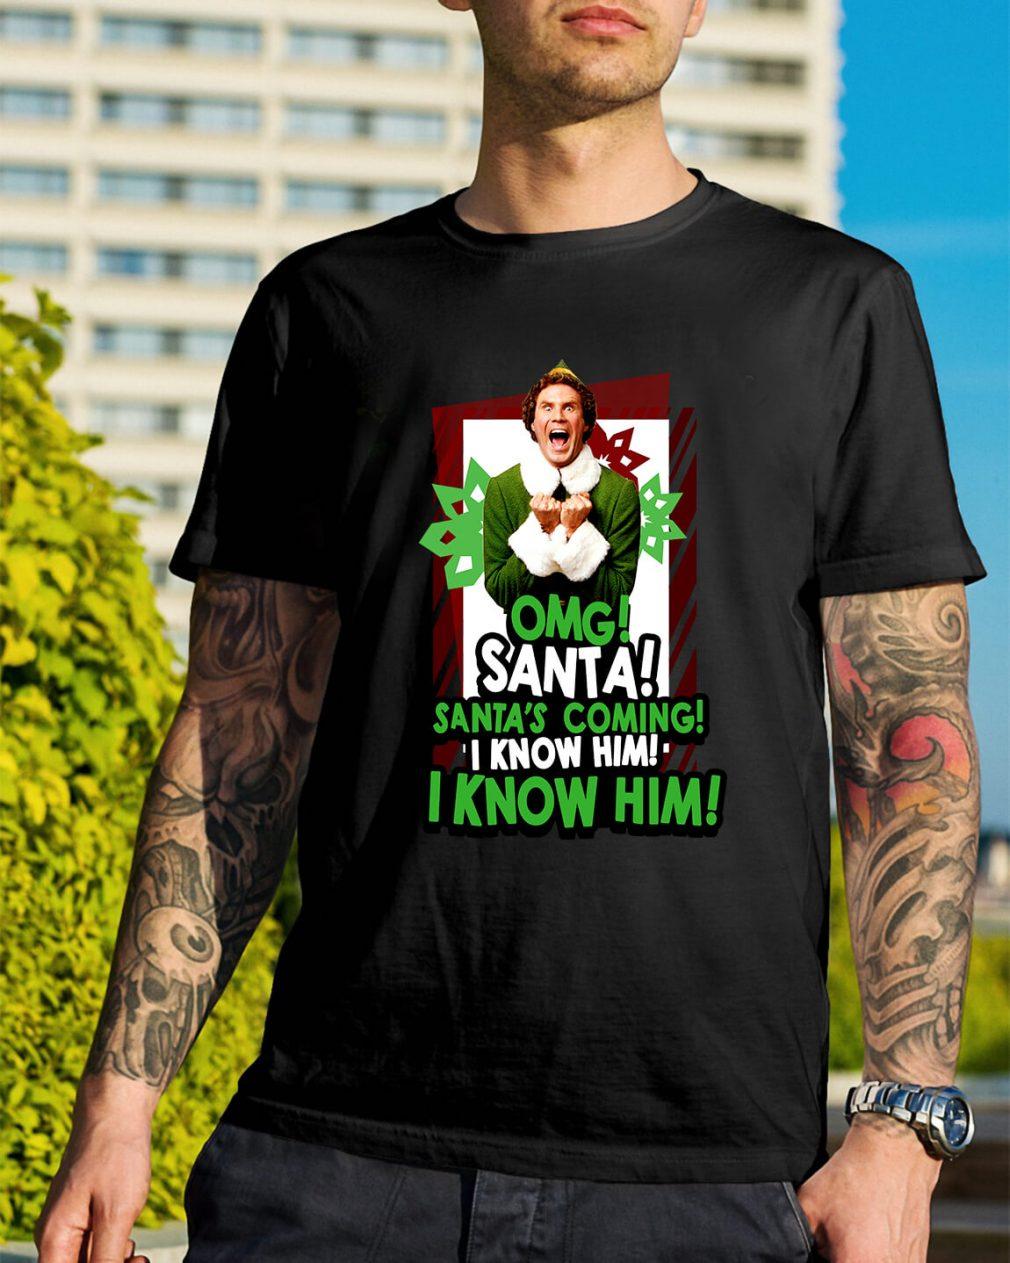 Omg Santa Santa's coming I know him I know him Guys Shirt